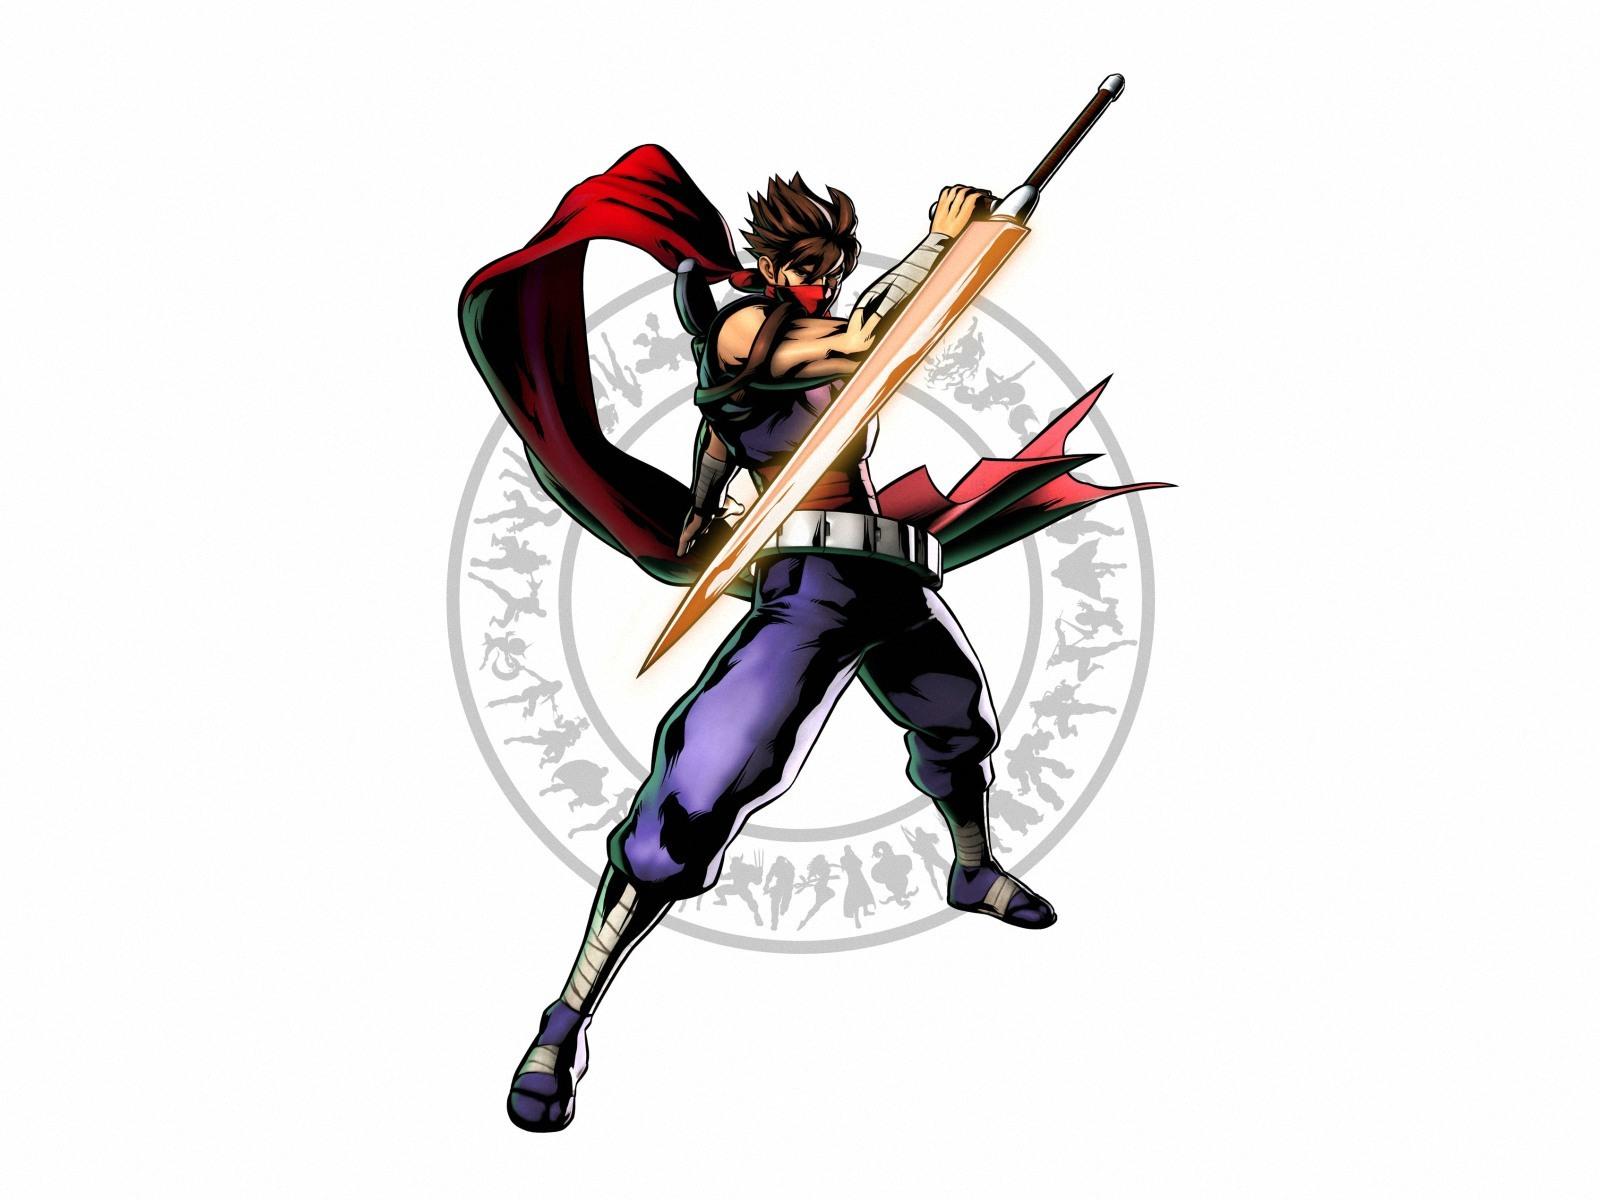 Hawkeye WallpapersMarvel Vs Capcom Wallpapers Pictures 1600x1200